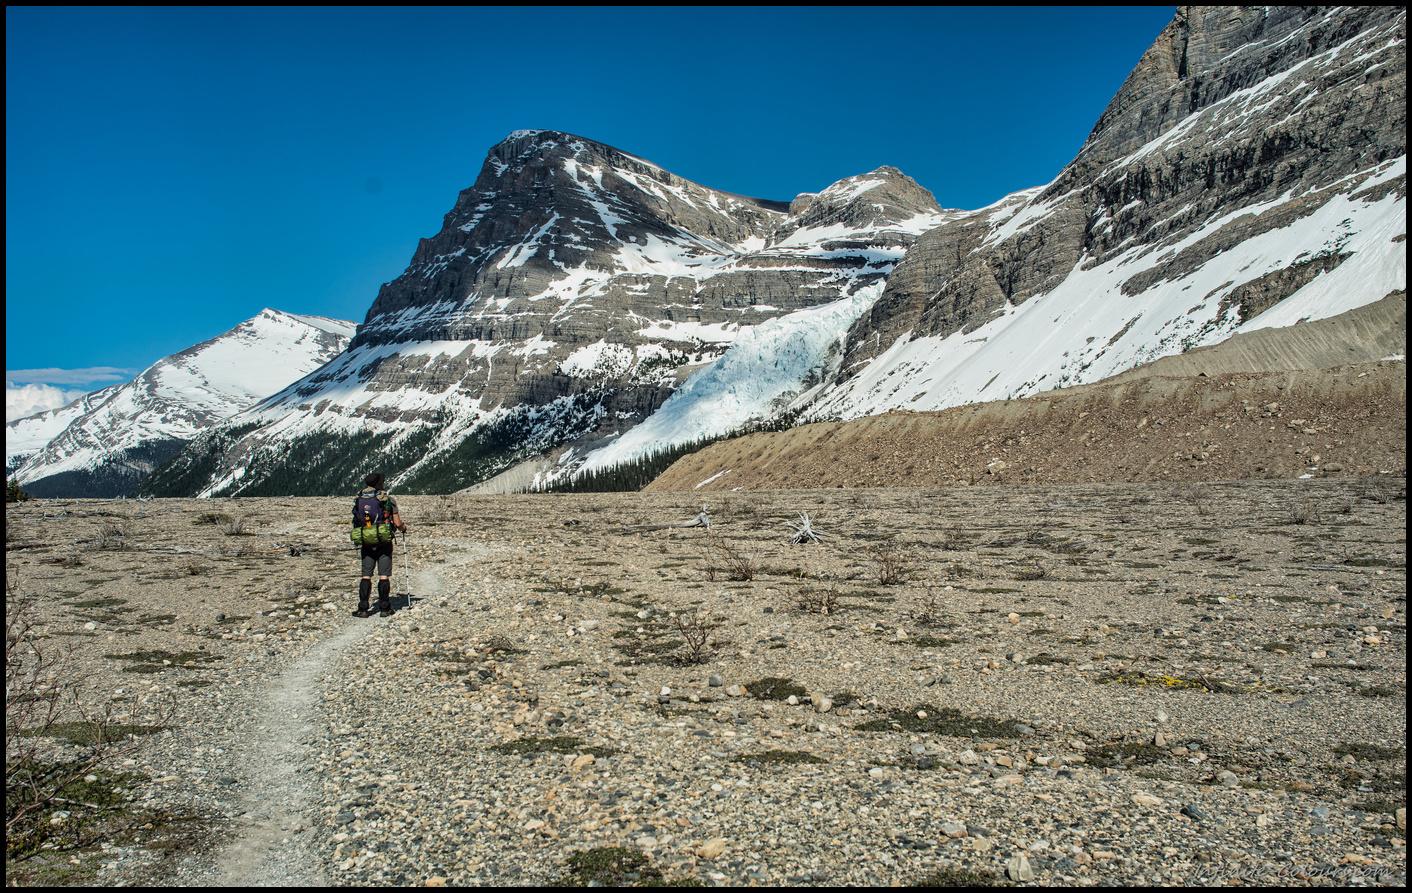 Scenery close to Marmot campsite on Berg Lake Trail